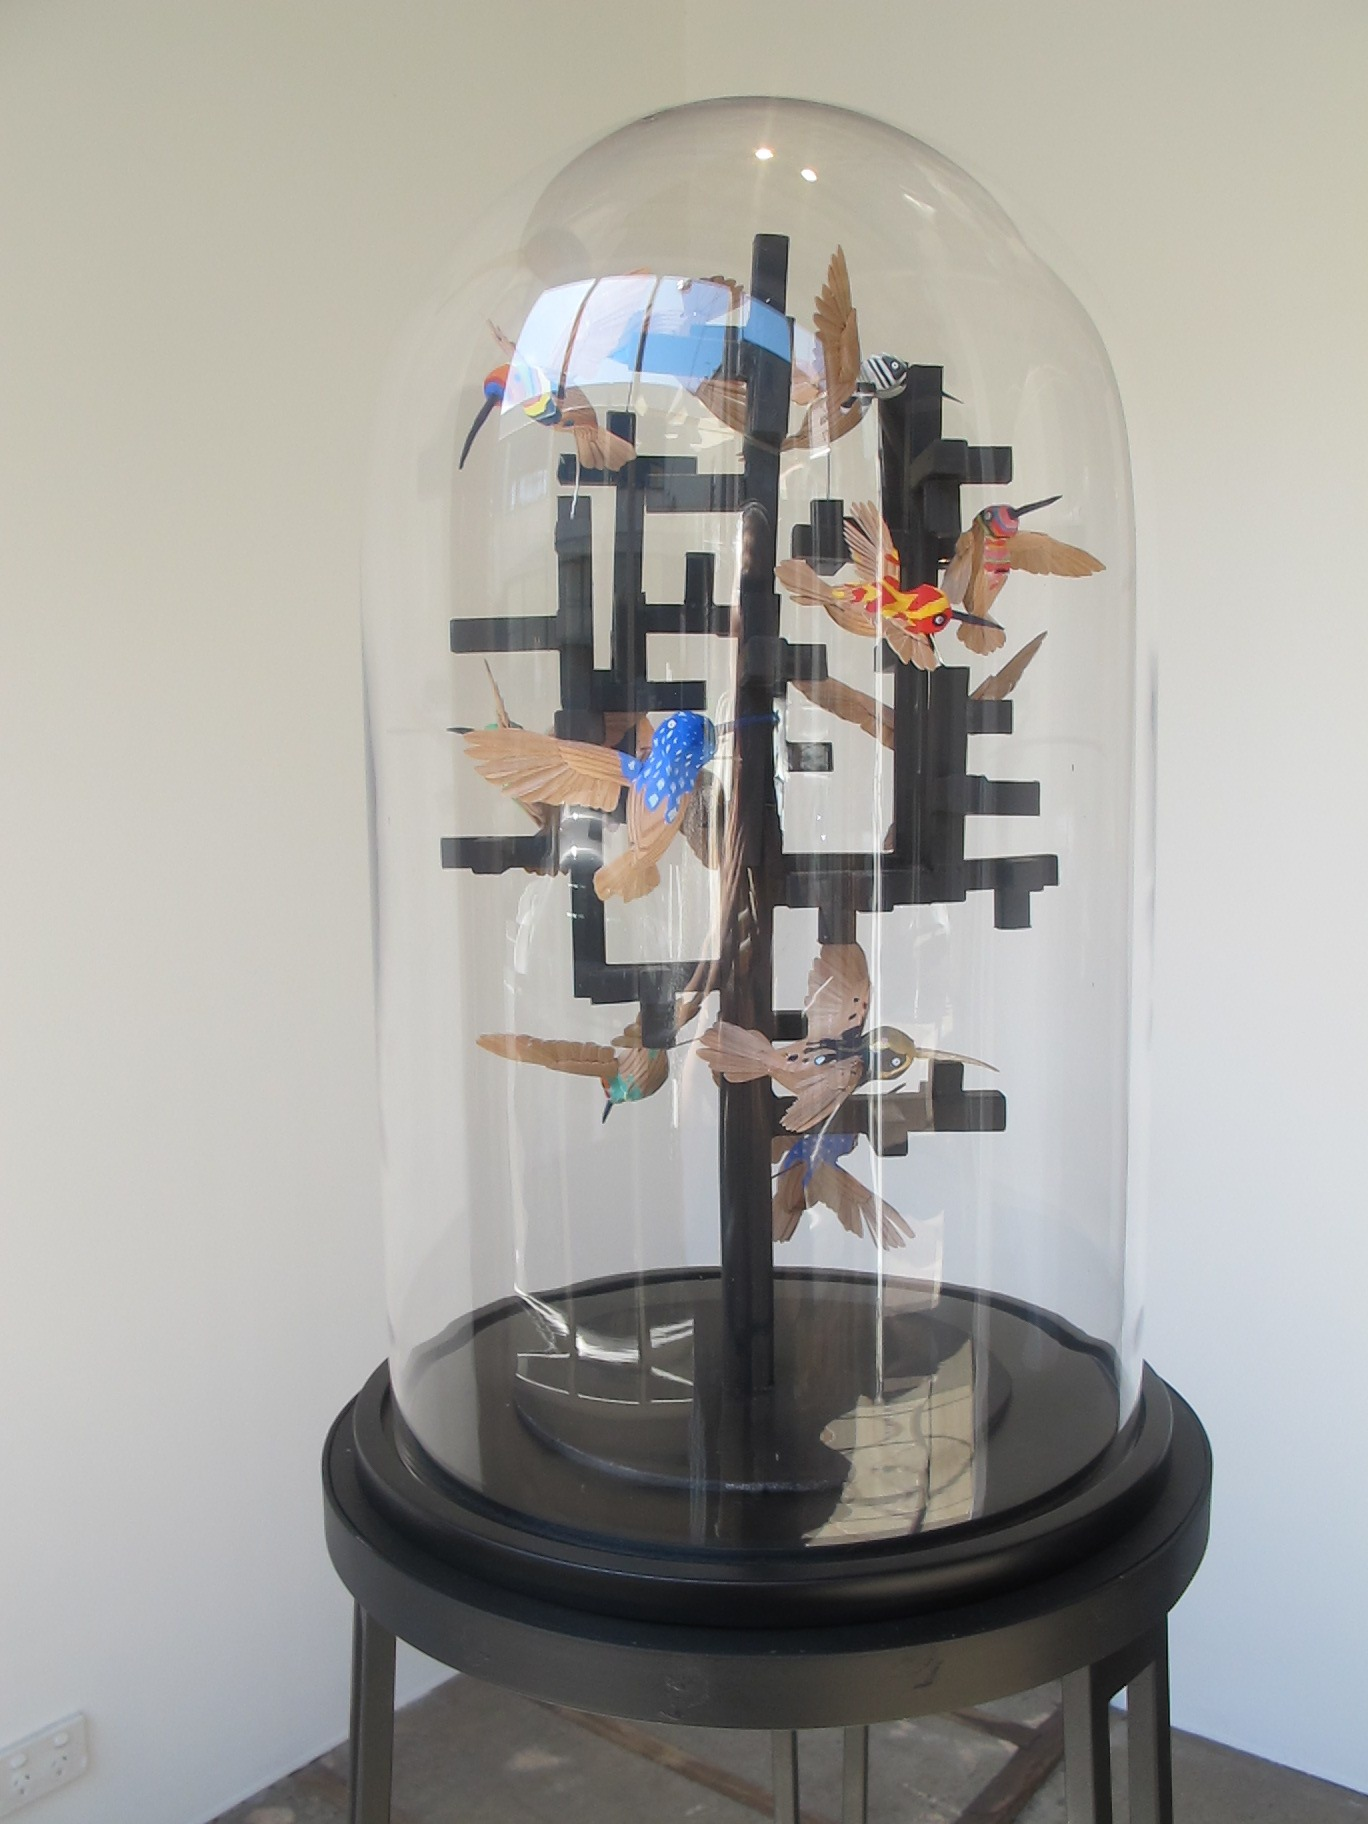 Simon MacEwan, Peace through understanding , 2011, steel, handcrafted cedar birds, gouache, glass dome, 160 x 40 x 40cm